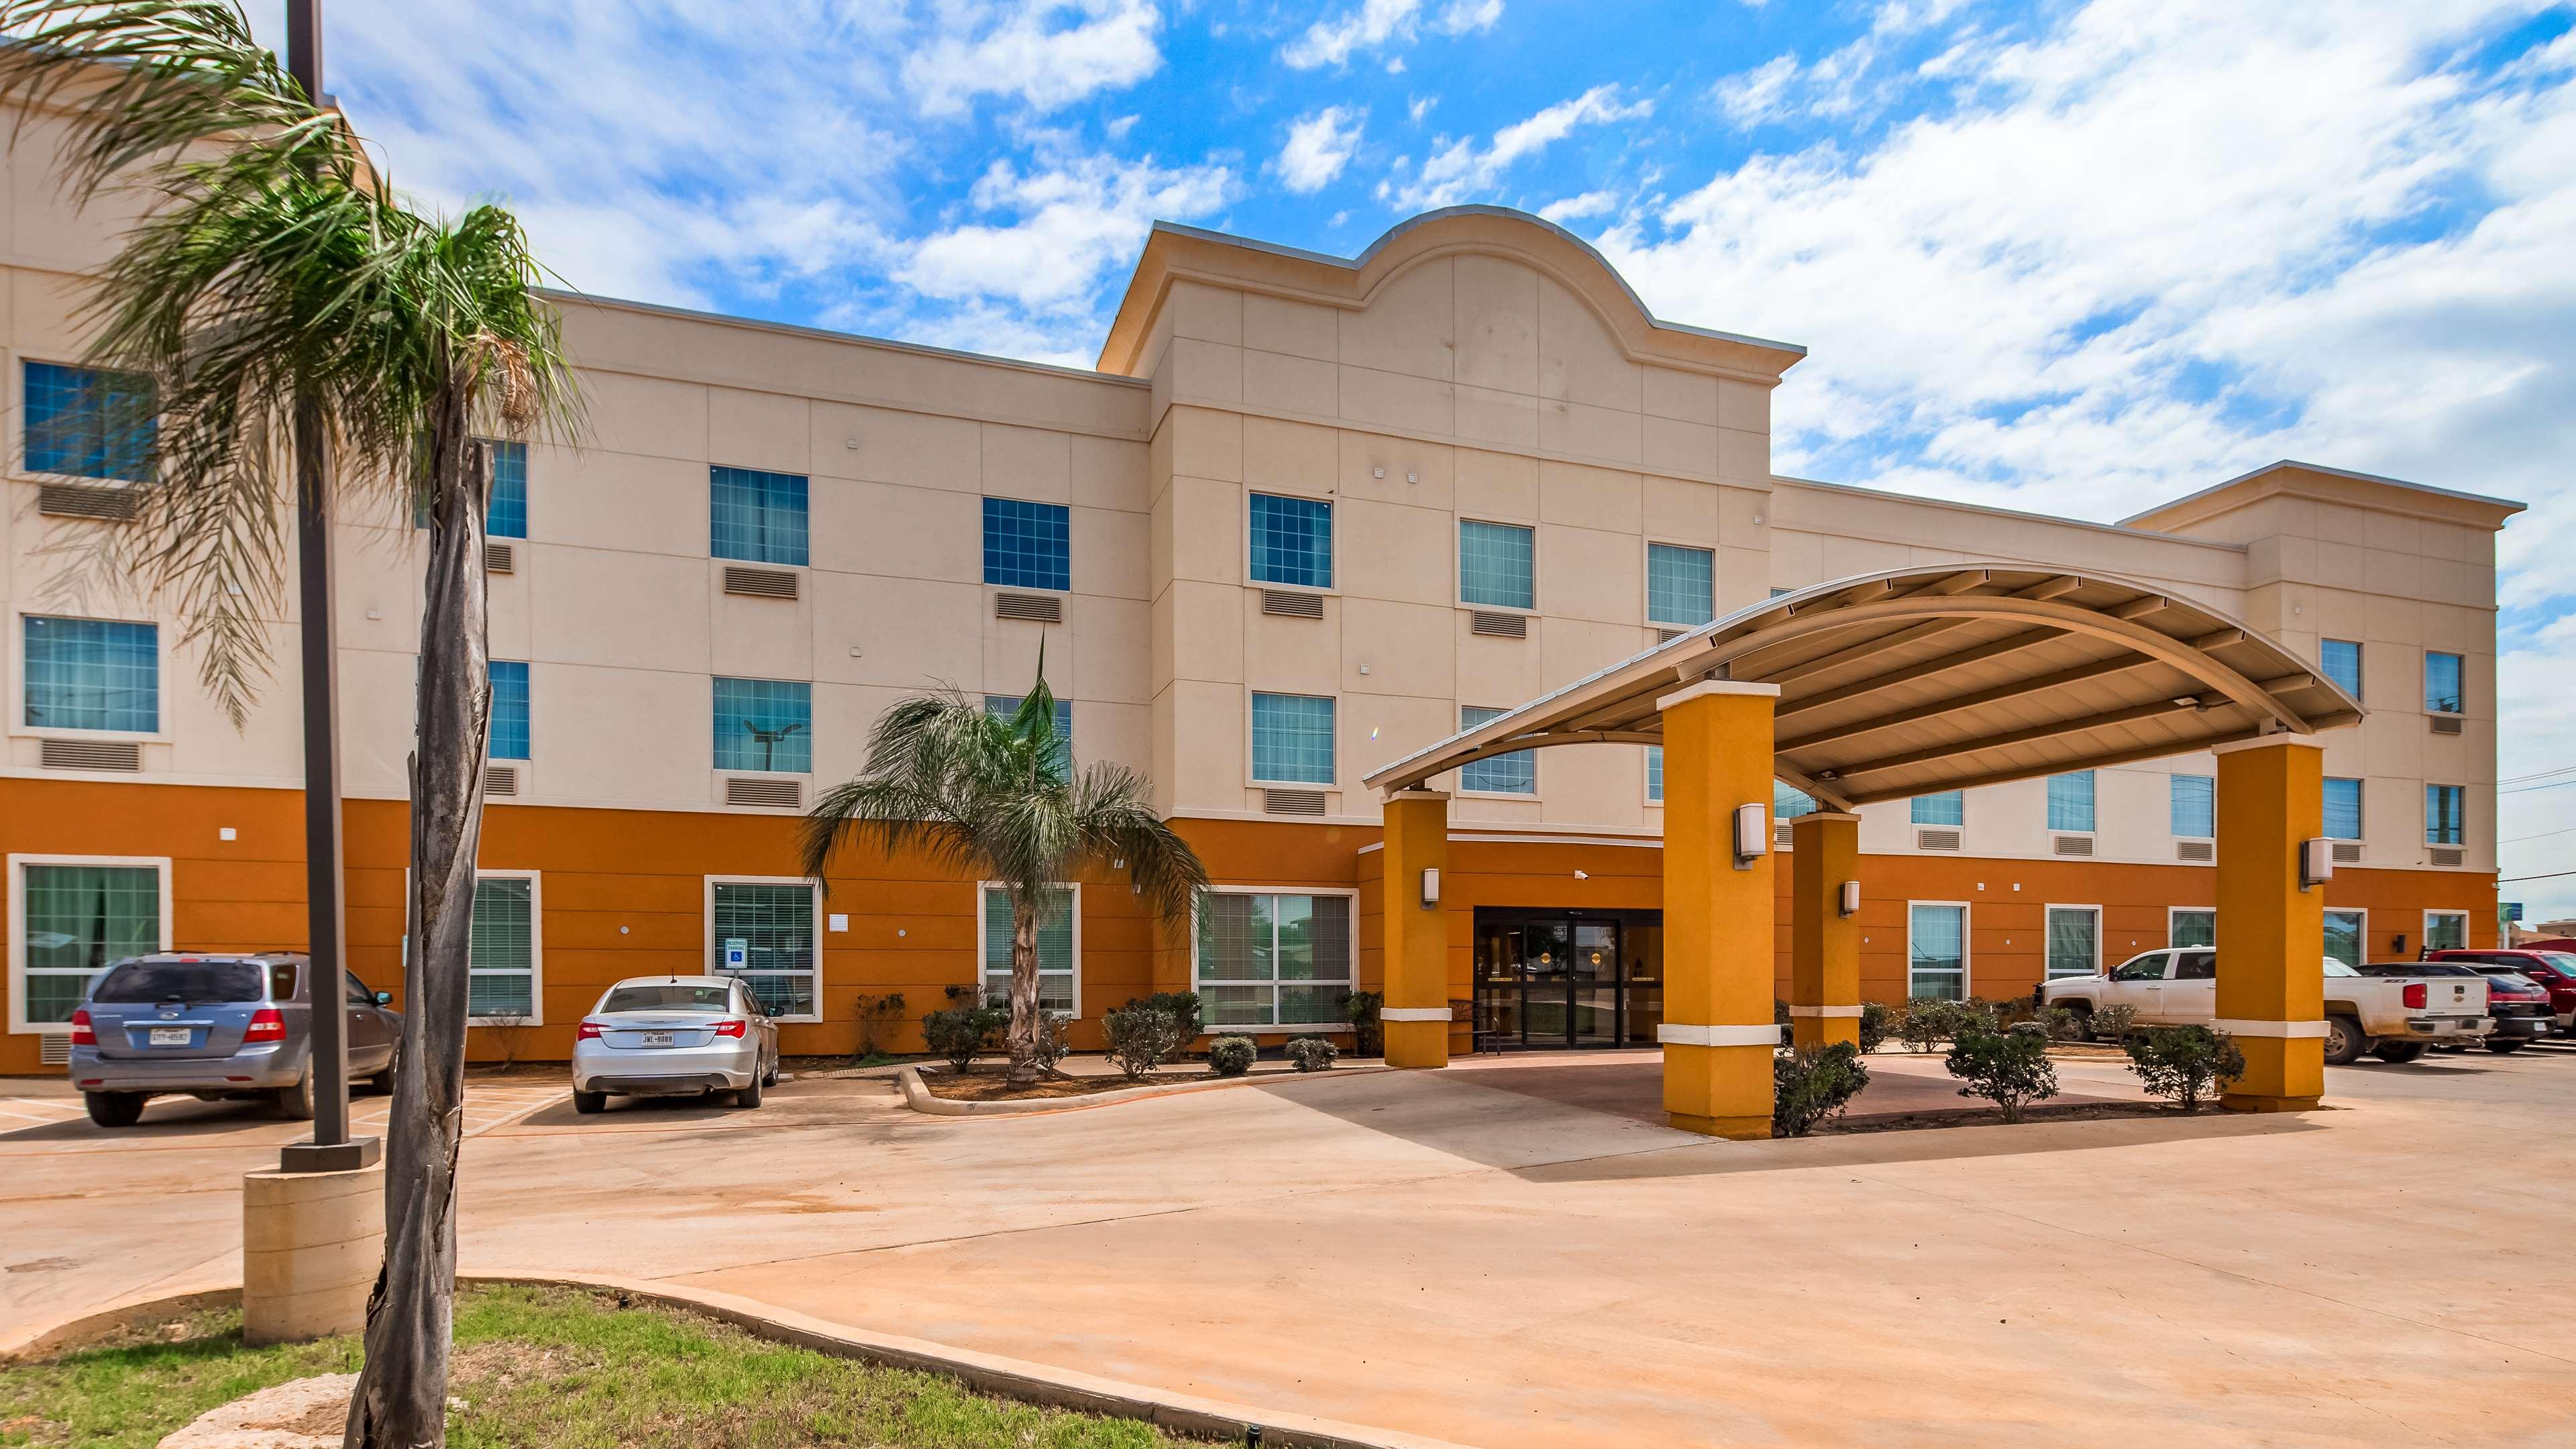 SureStay Hotel by Best Western Cotulla image 0